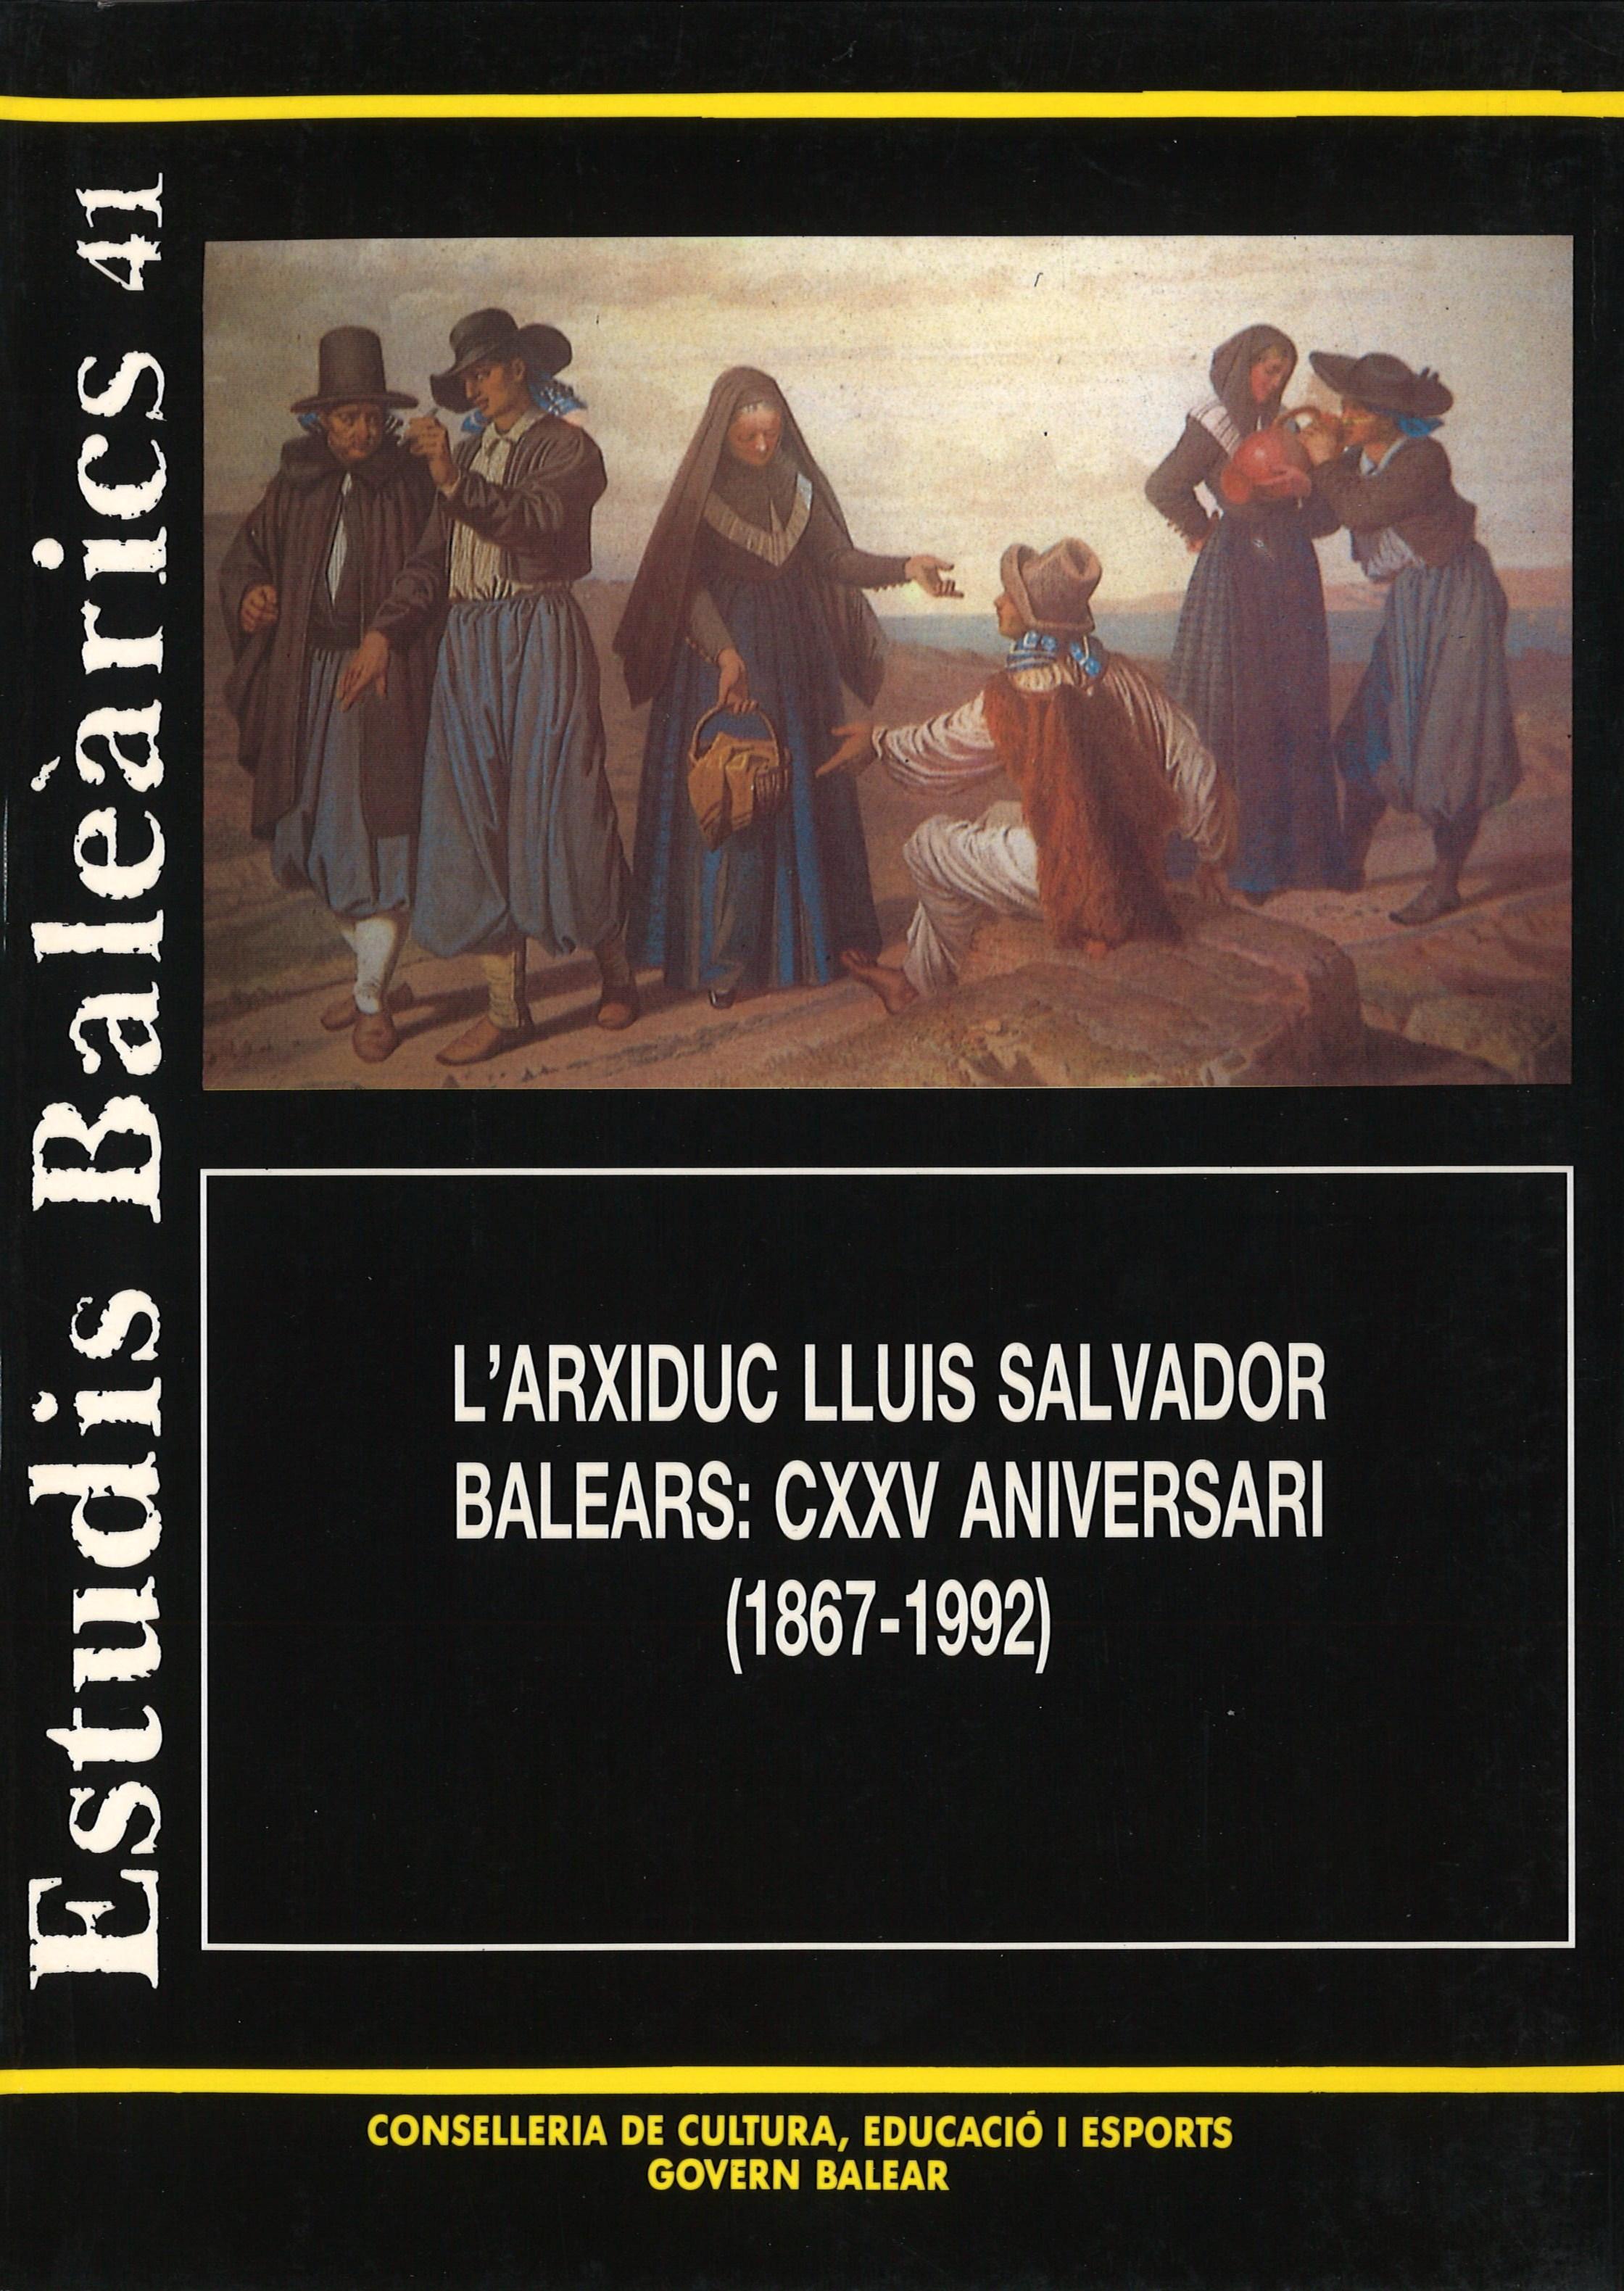 L'ARXIDUC LLUIS SALVADOR. BALEARS: CXXV ANIVERSARI (1867-1992) - núm. 41